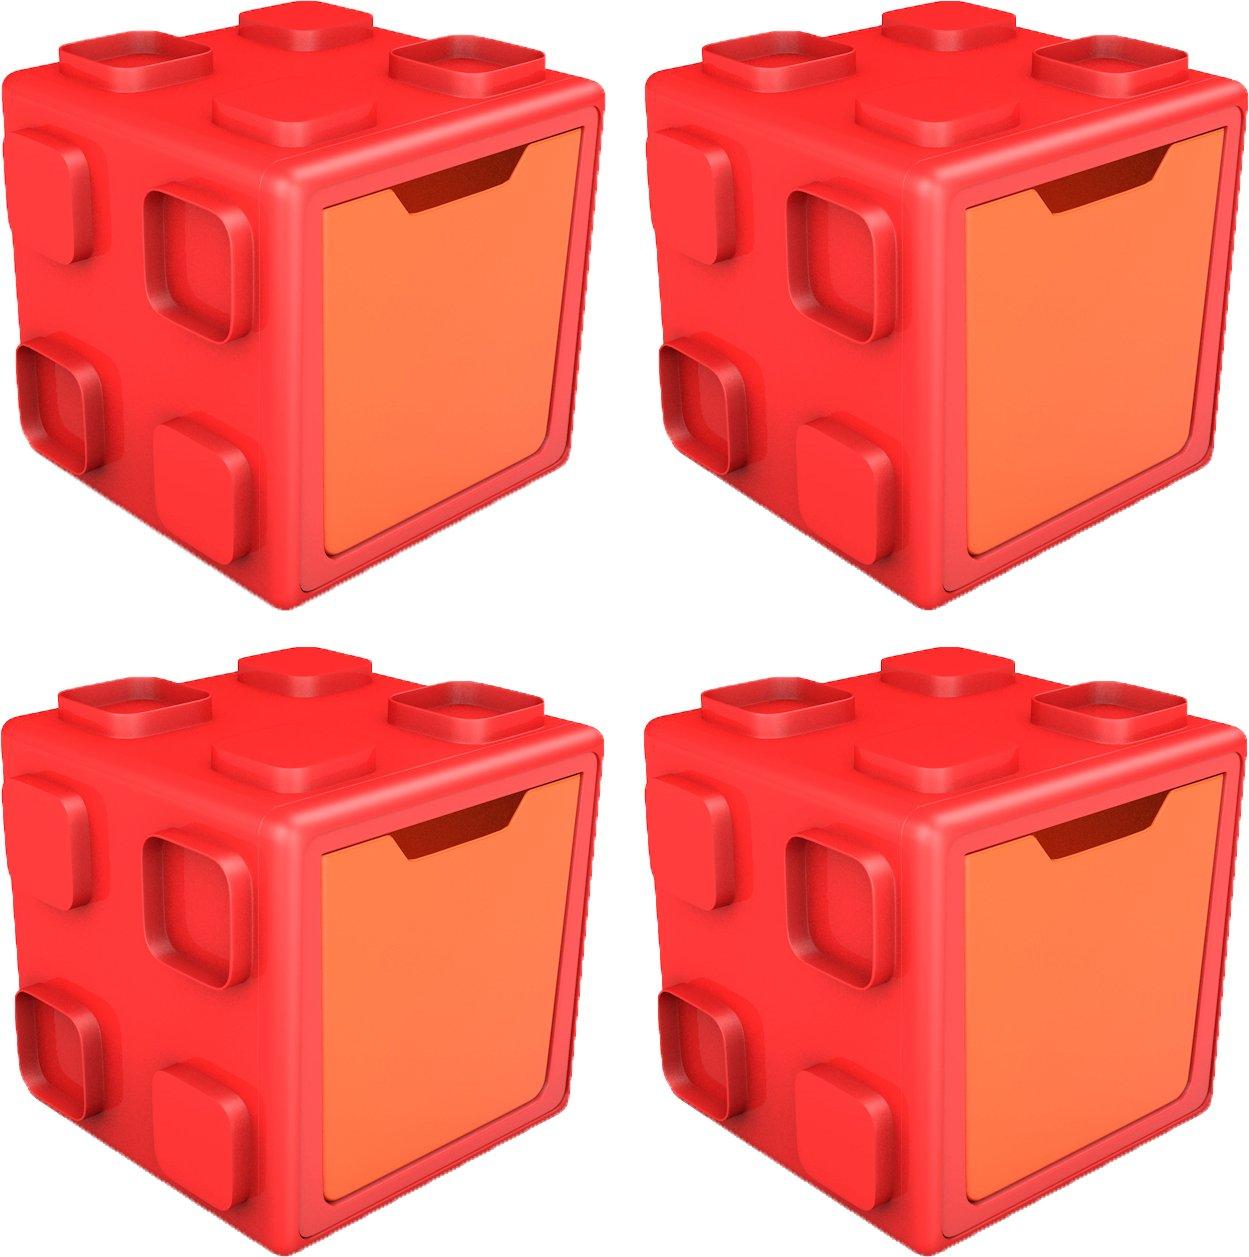 Chillafishボックス:接続可能なおもちゃストレージと再生システム Pack of 4 CPCB01REO-4PK B06X3VRRKY Red / Orange Pack of 4